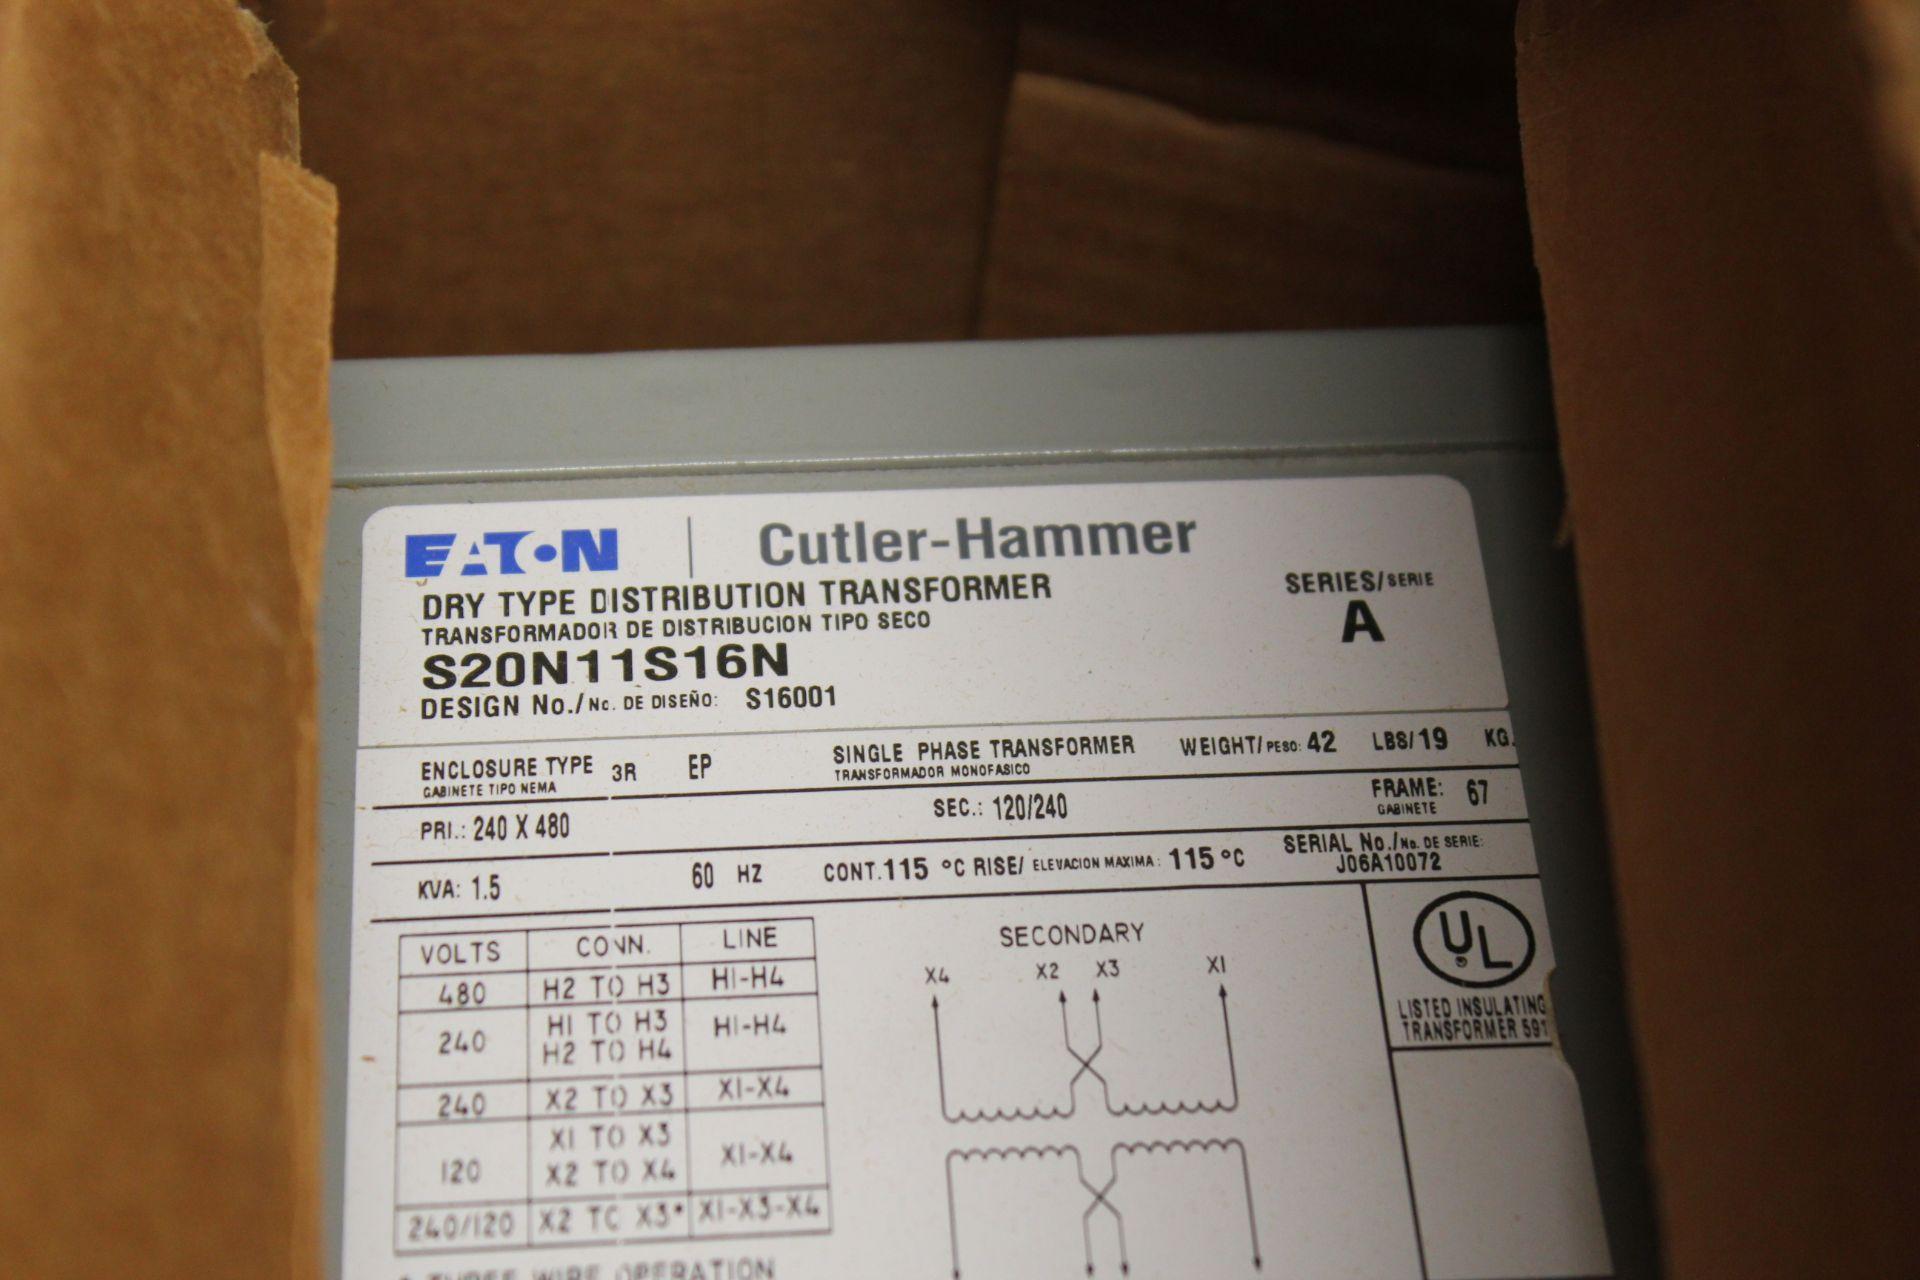 NEW EATON DISTRIBUTION TRANSFORMER - Image 2 of 3